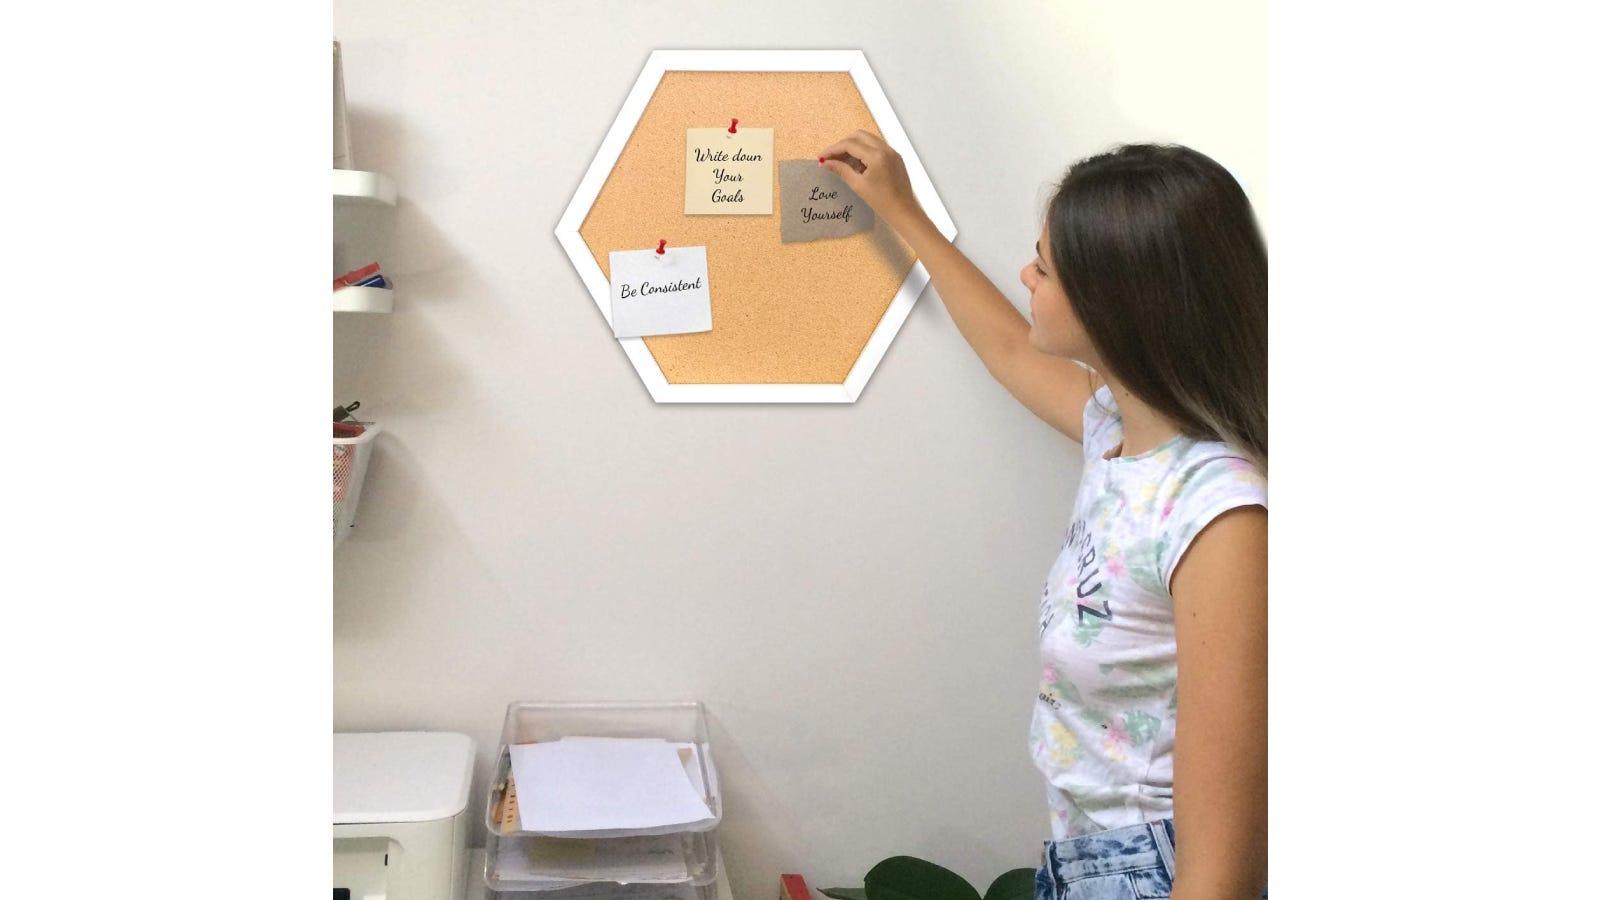 A woman sticking a note to a hexagonal bulletin board.